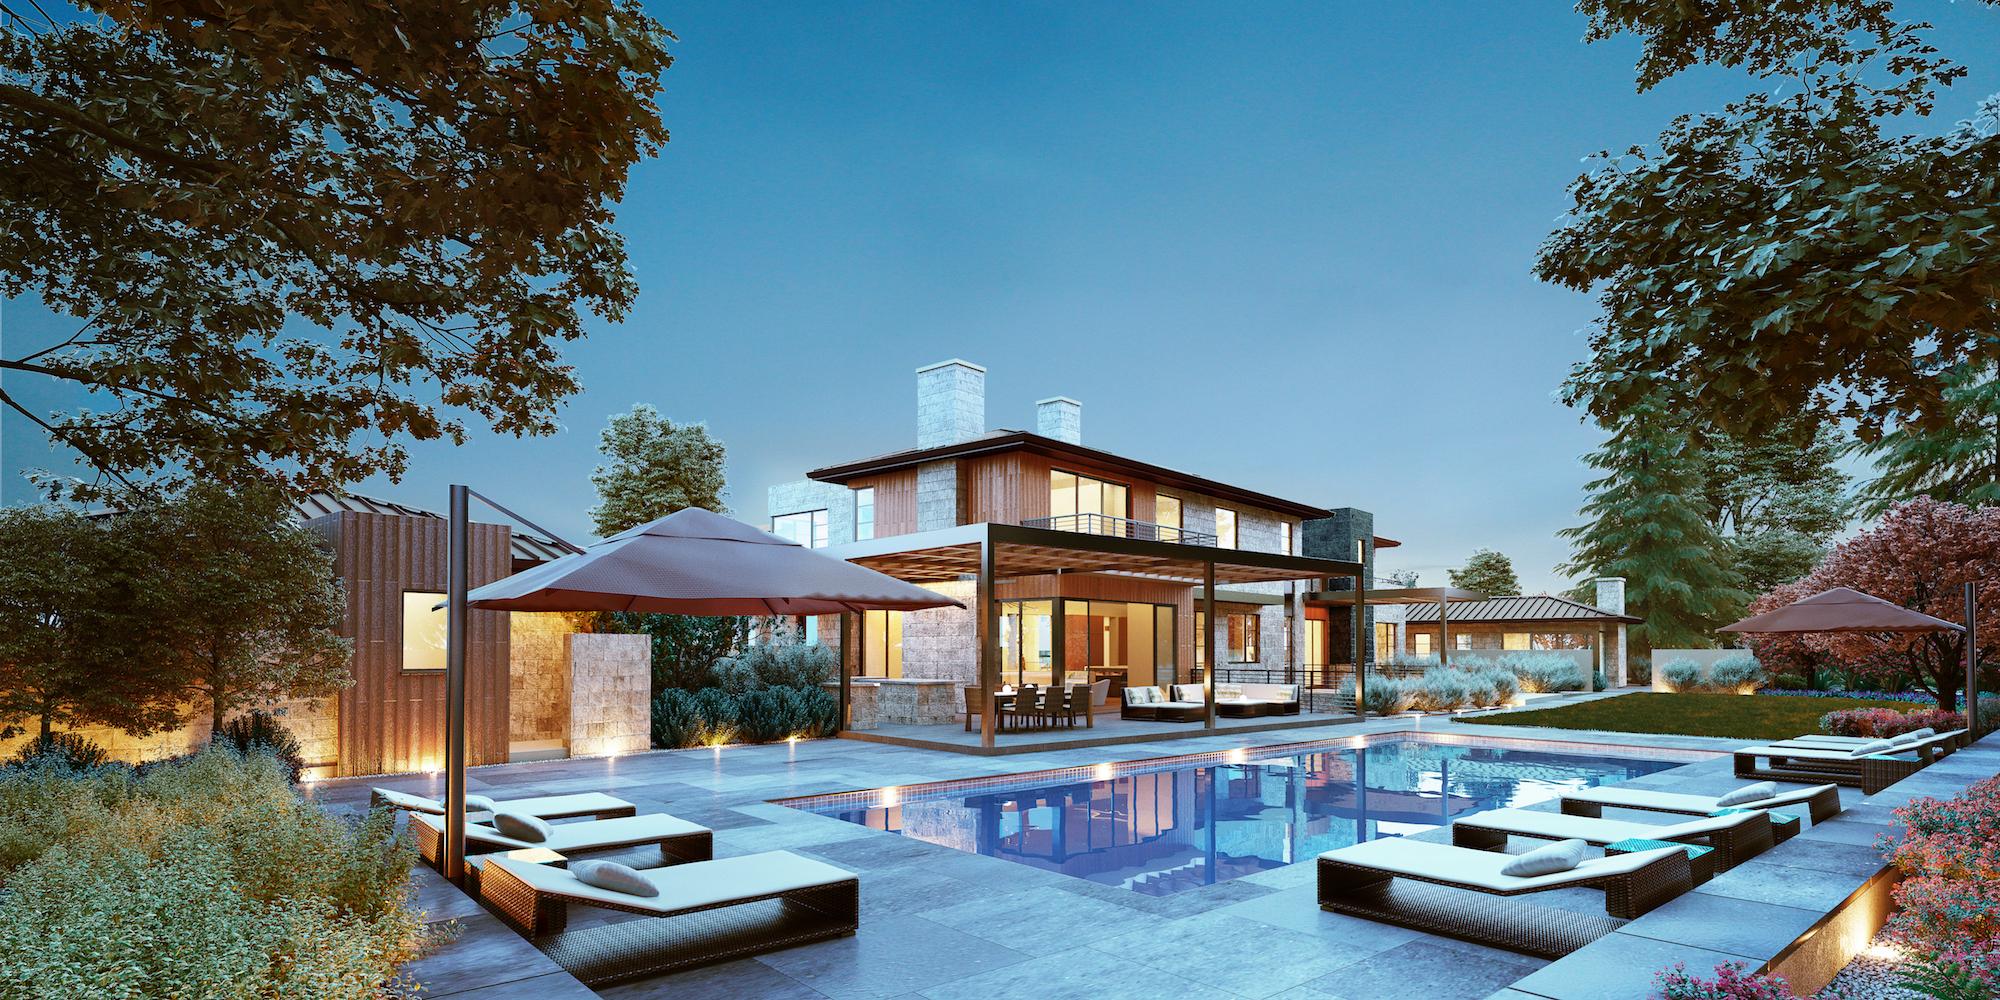 Atherton Spec Home New Build Preview Vivian Soliemani